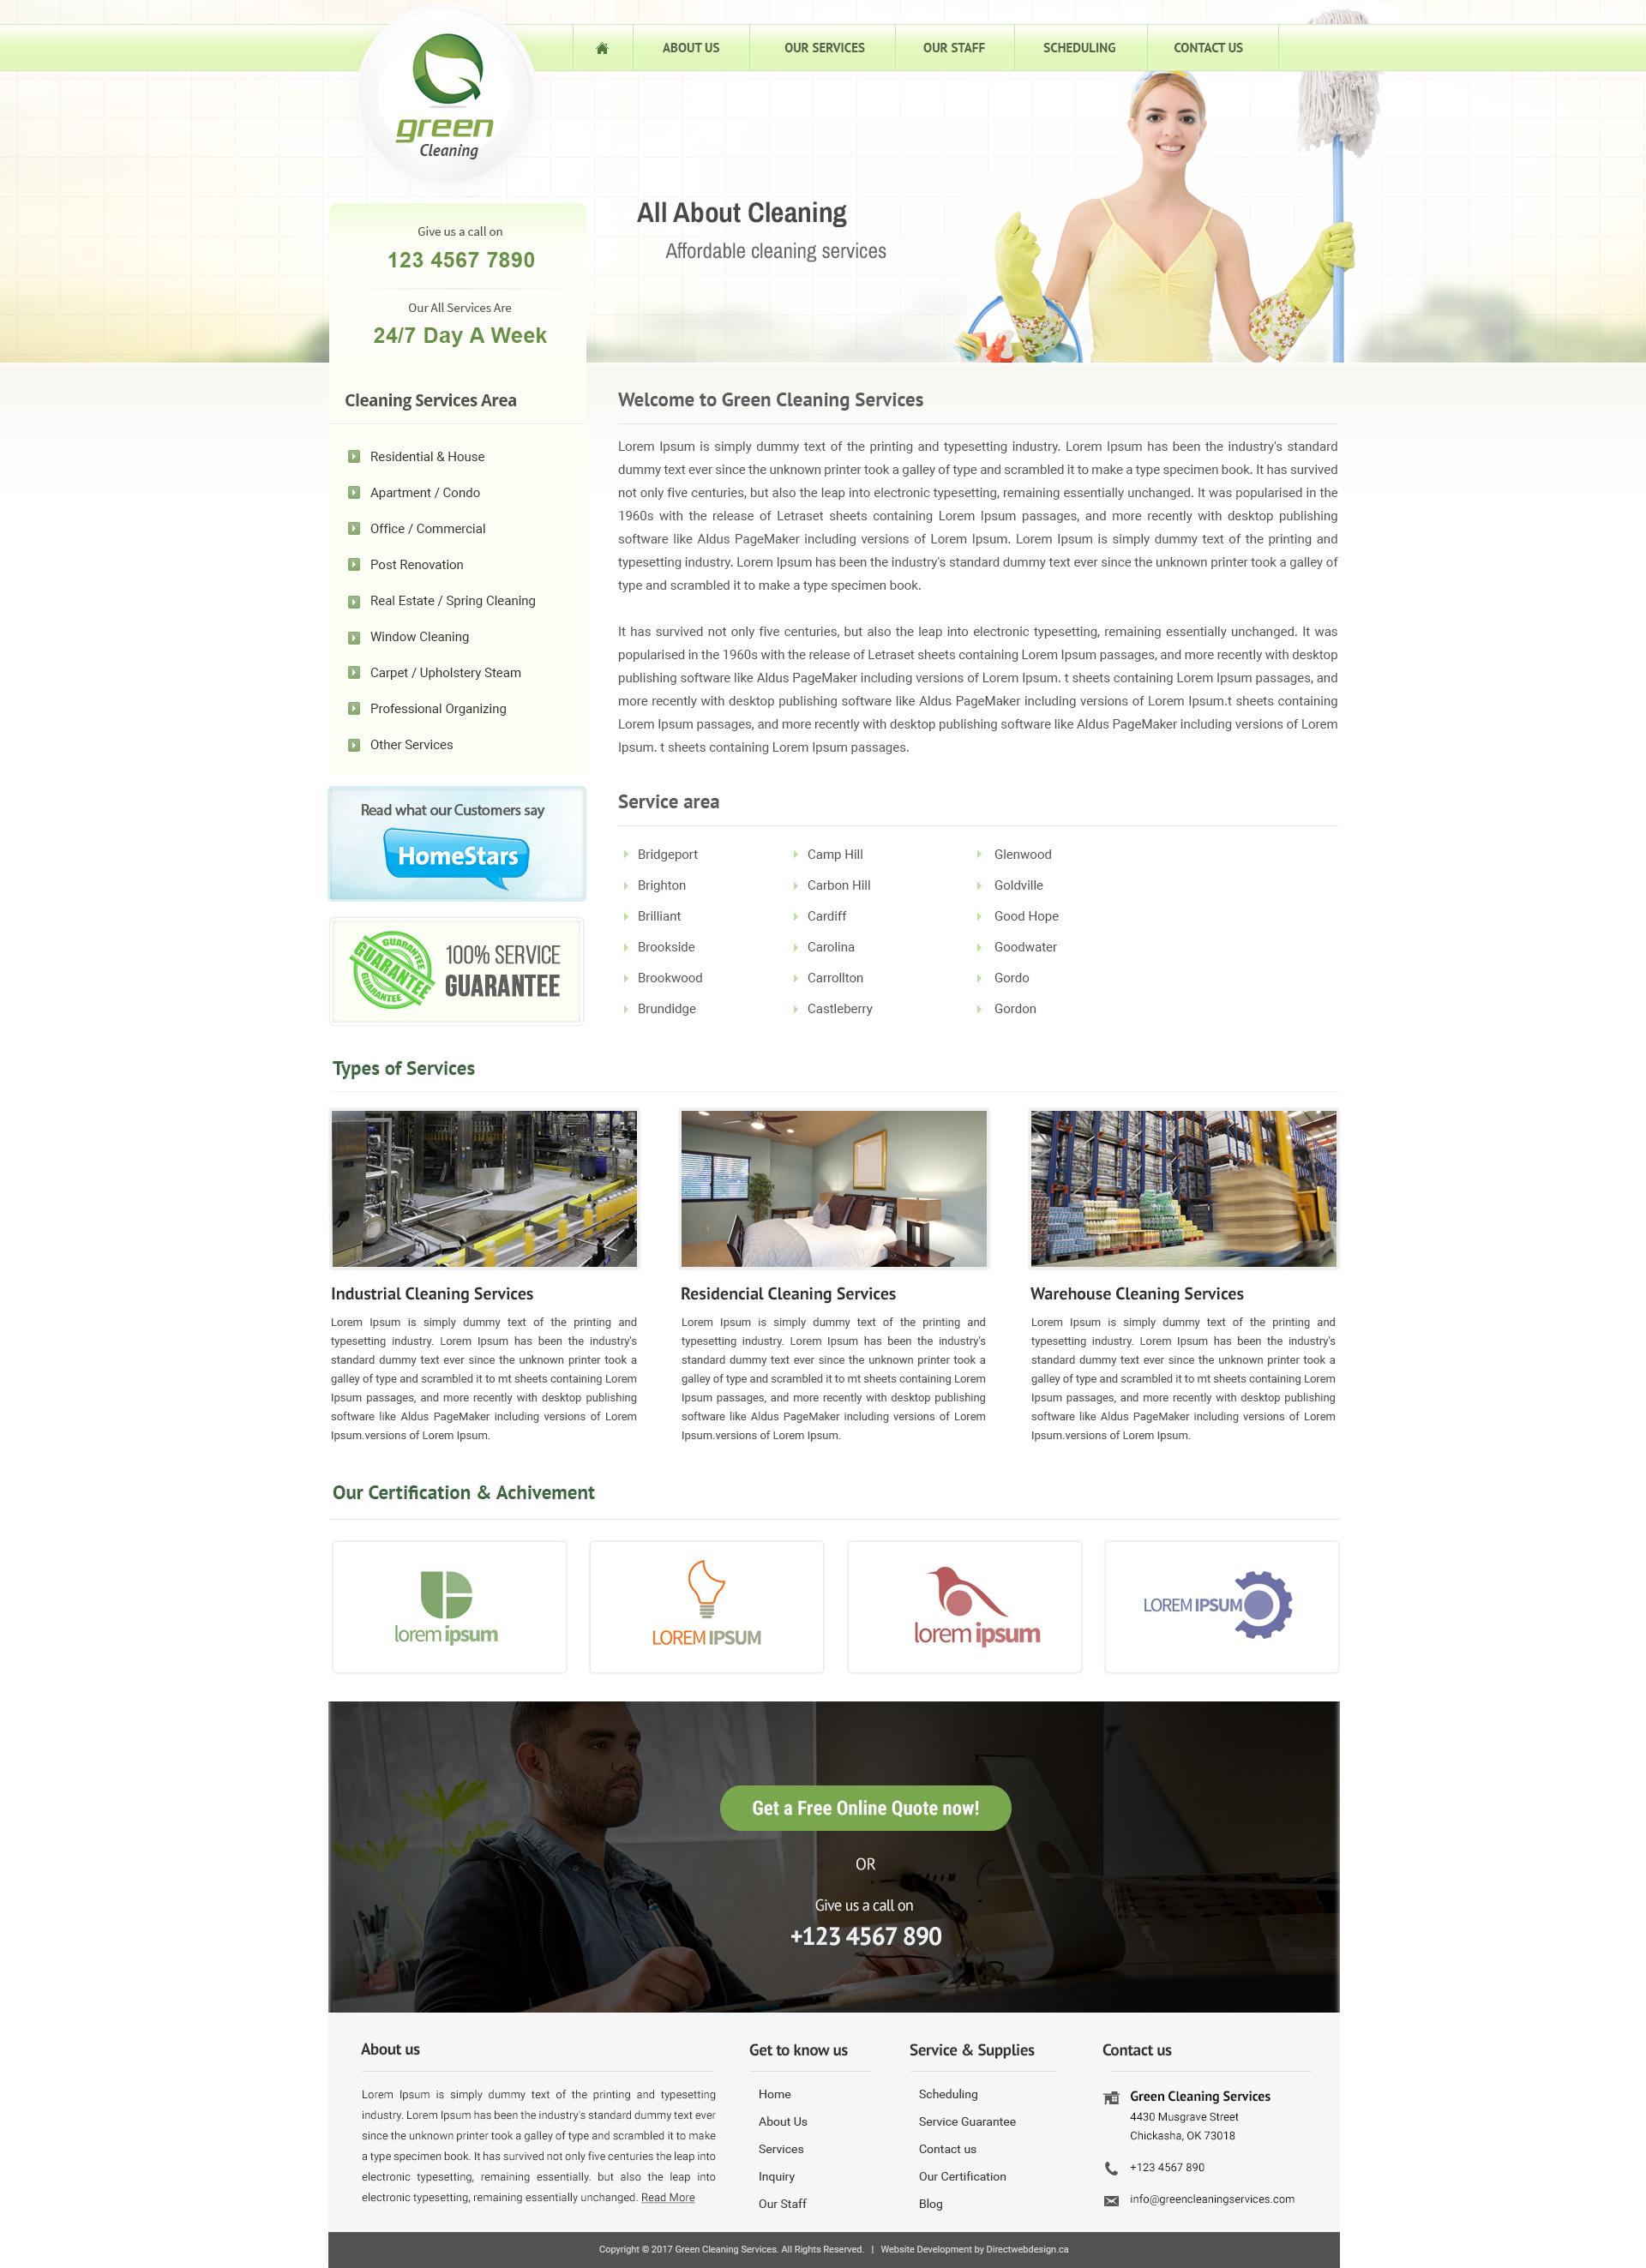 Unique customizable website templates | Direct Web Design